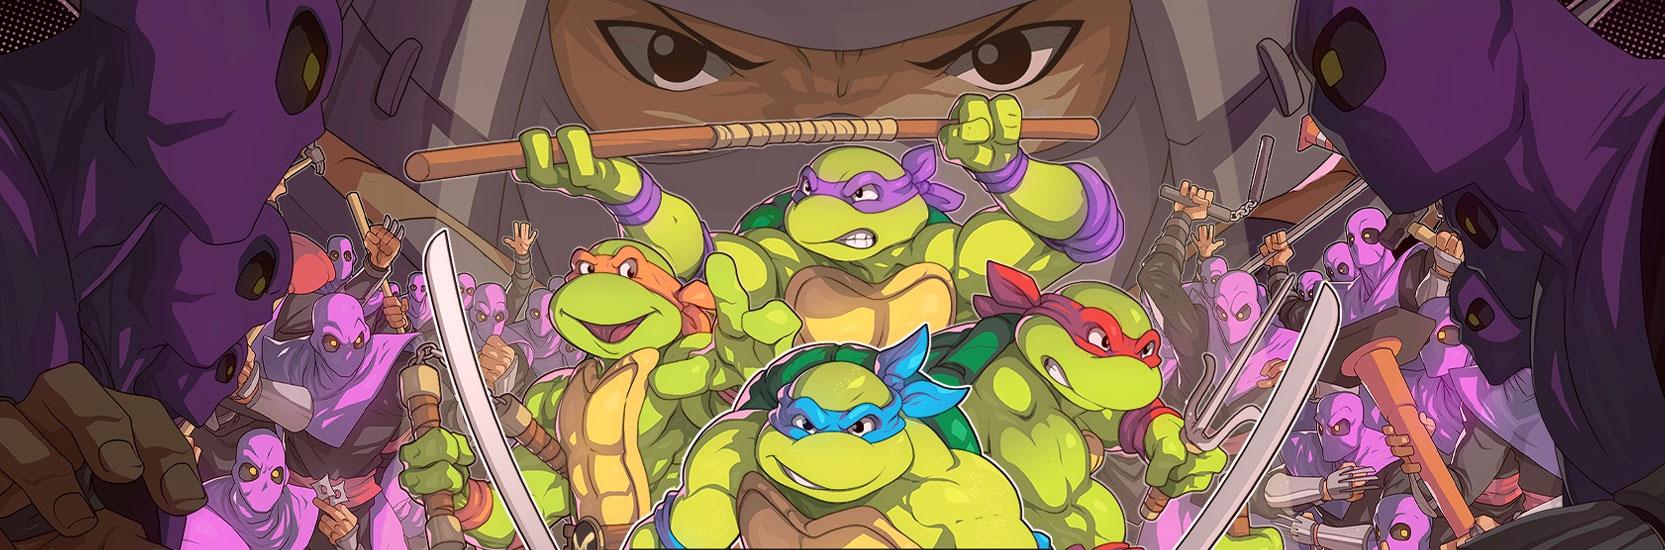 """Teenage Mutant Ninja Turtles : Shredder's Revenge"" dévoile une bande annonce très 80's"